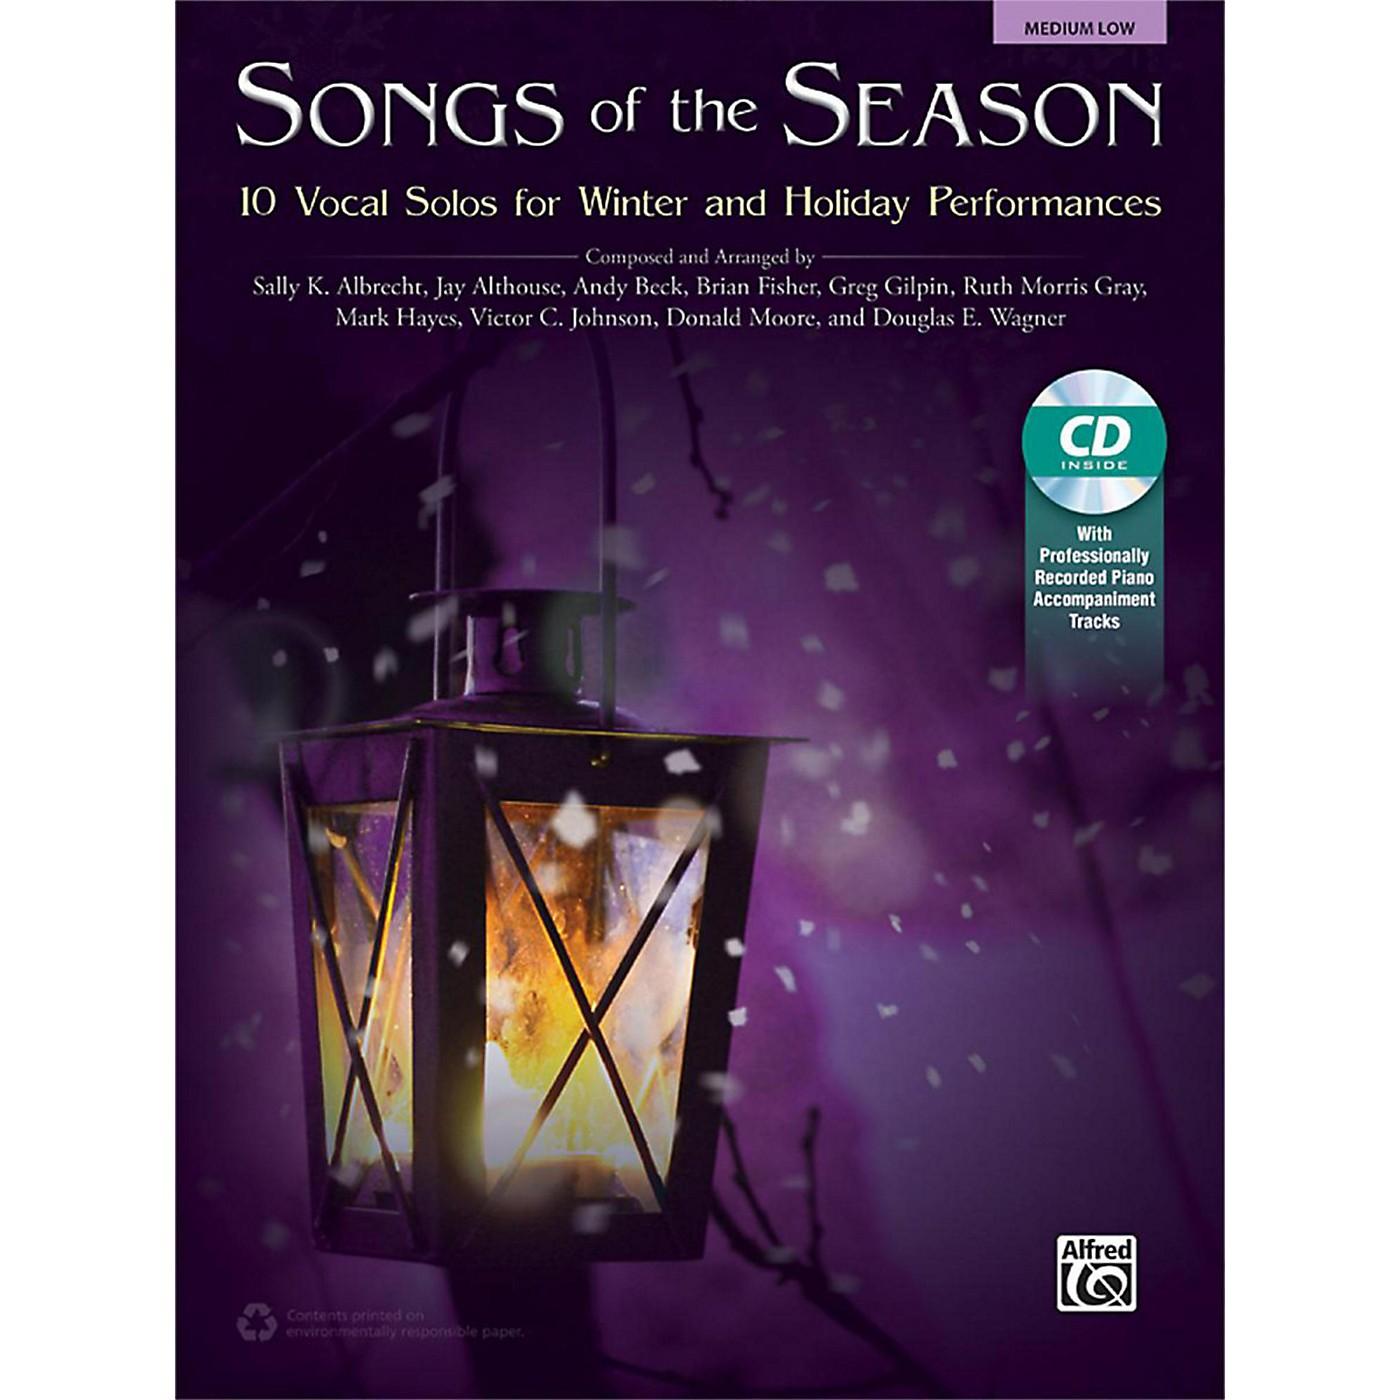 Alfred Songs of the Season Medium Low Book & Acc. CD thumbnail